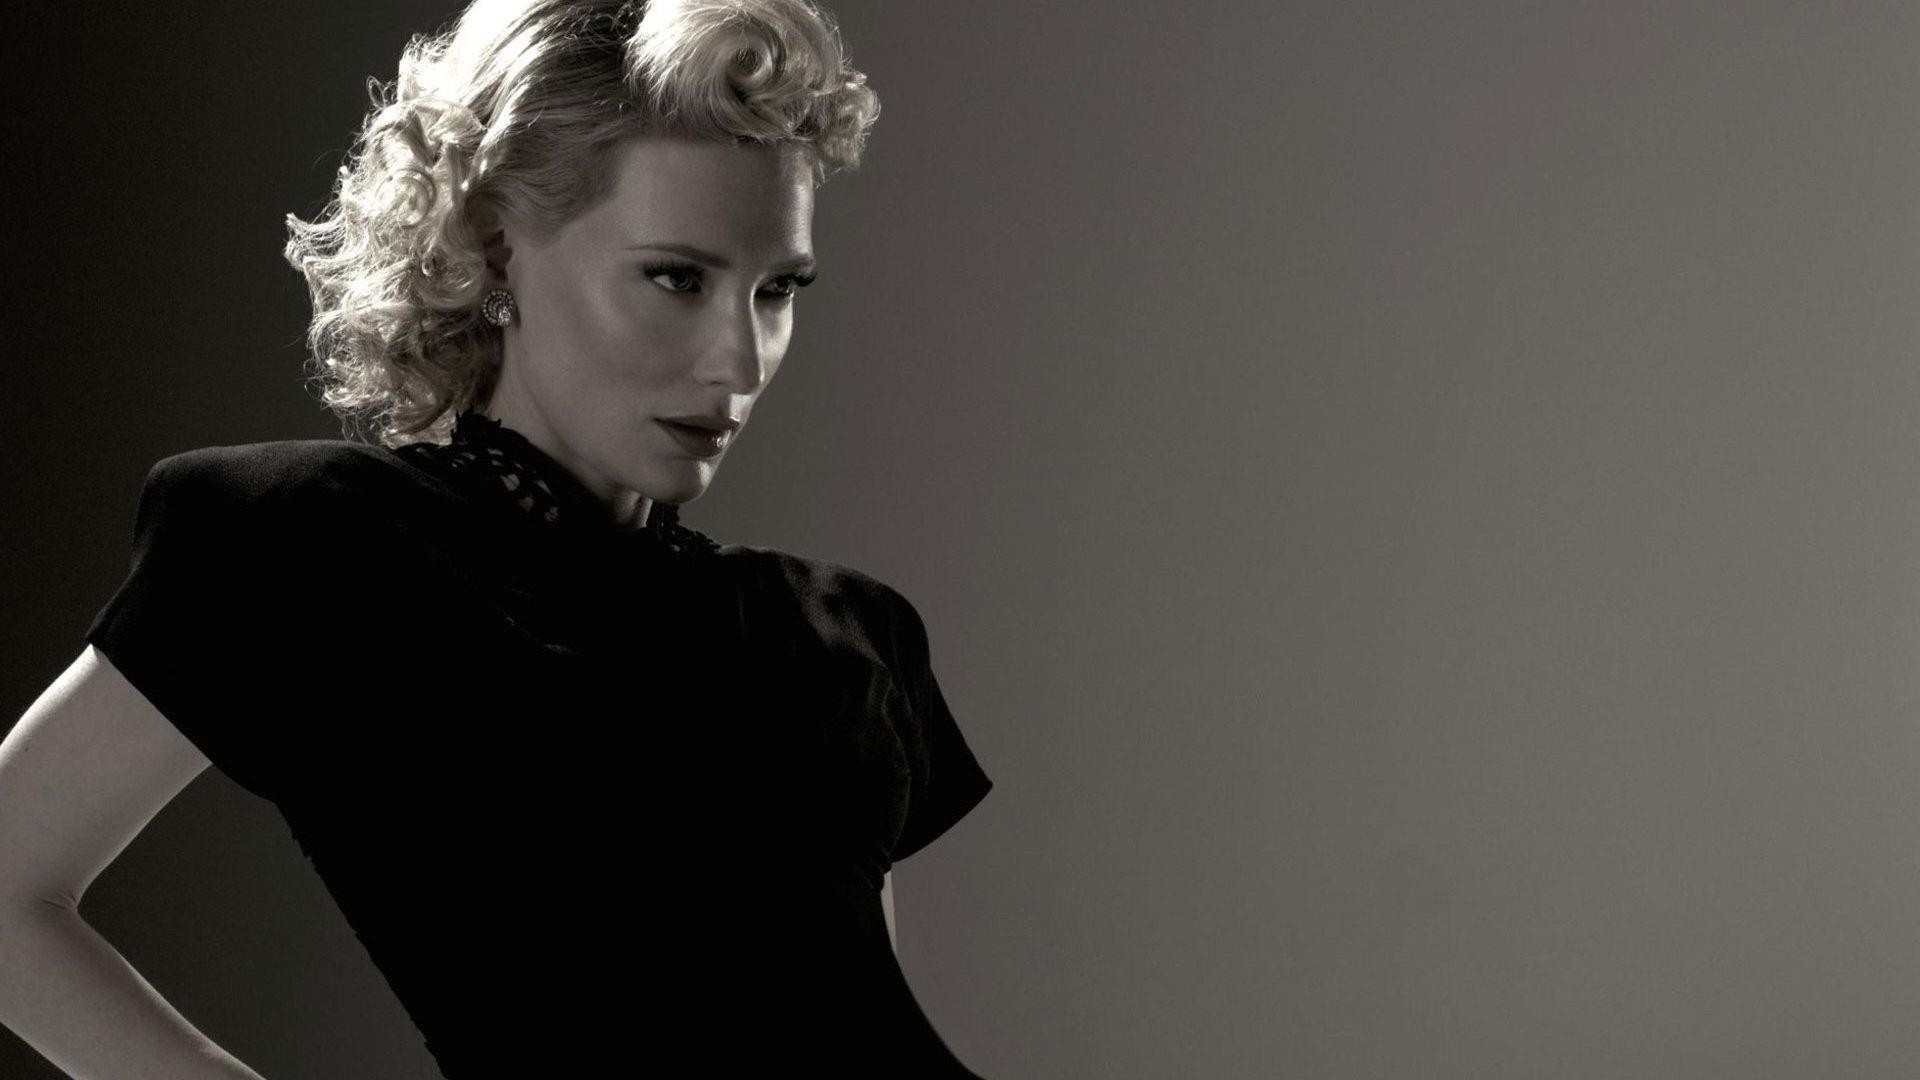 Sexy Cate Blanchett Wallpaper